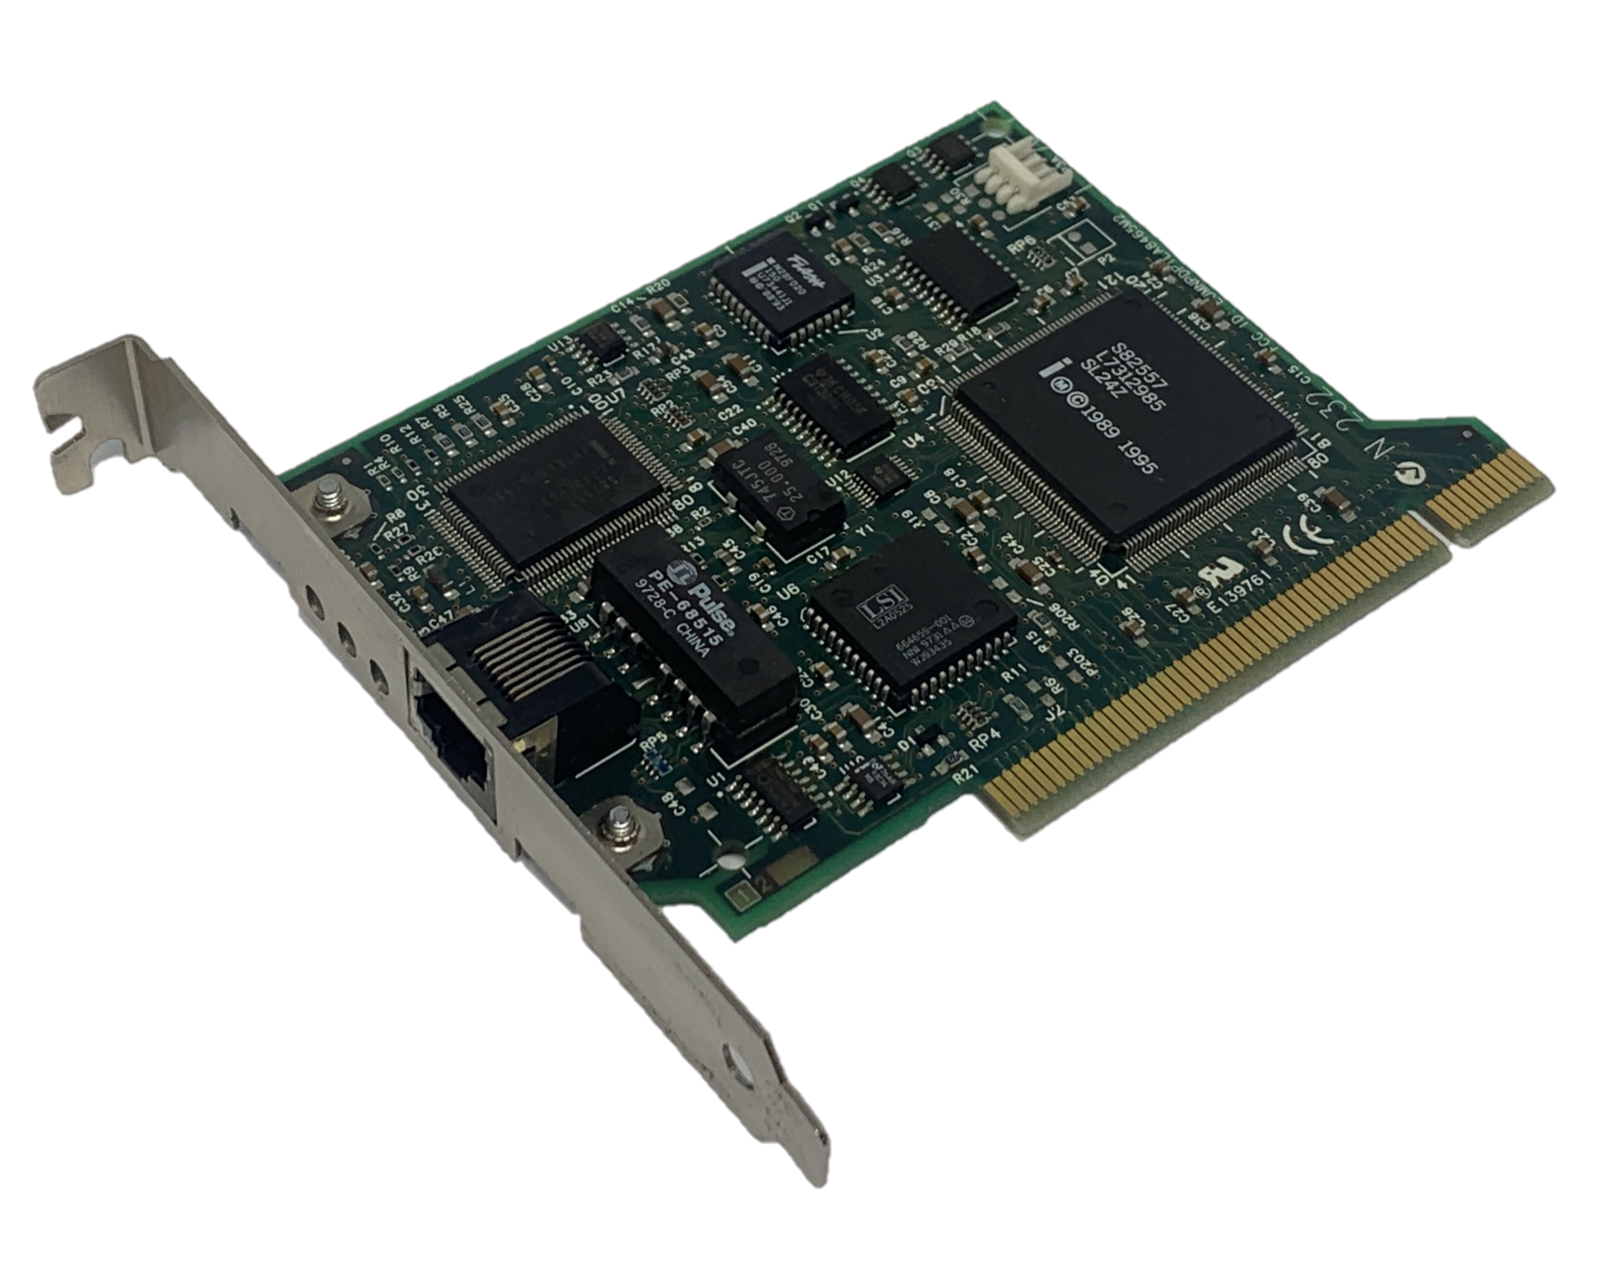 Intel LAN Pro 100 TX i8227 Ethernet Card 682704-001 PCI Network Card - Inc VAT